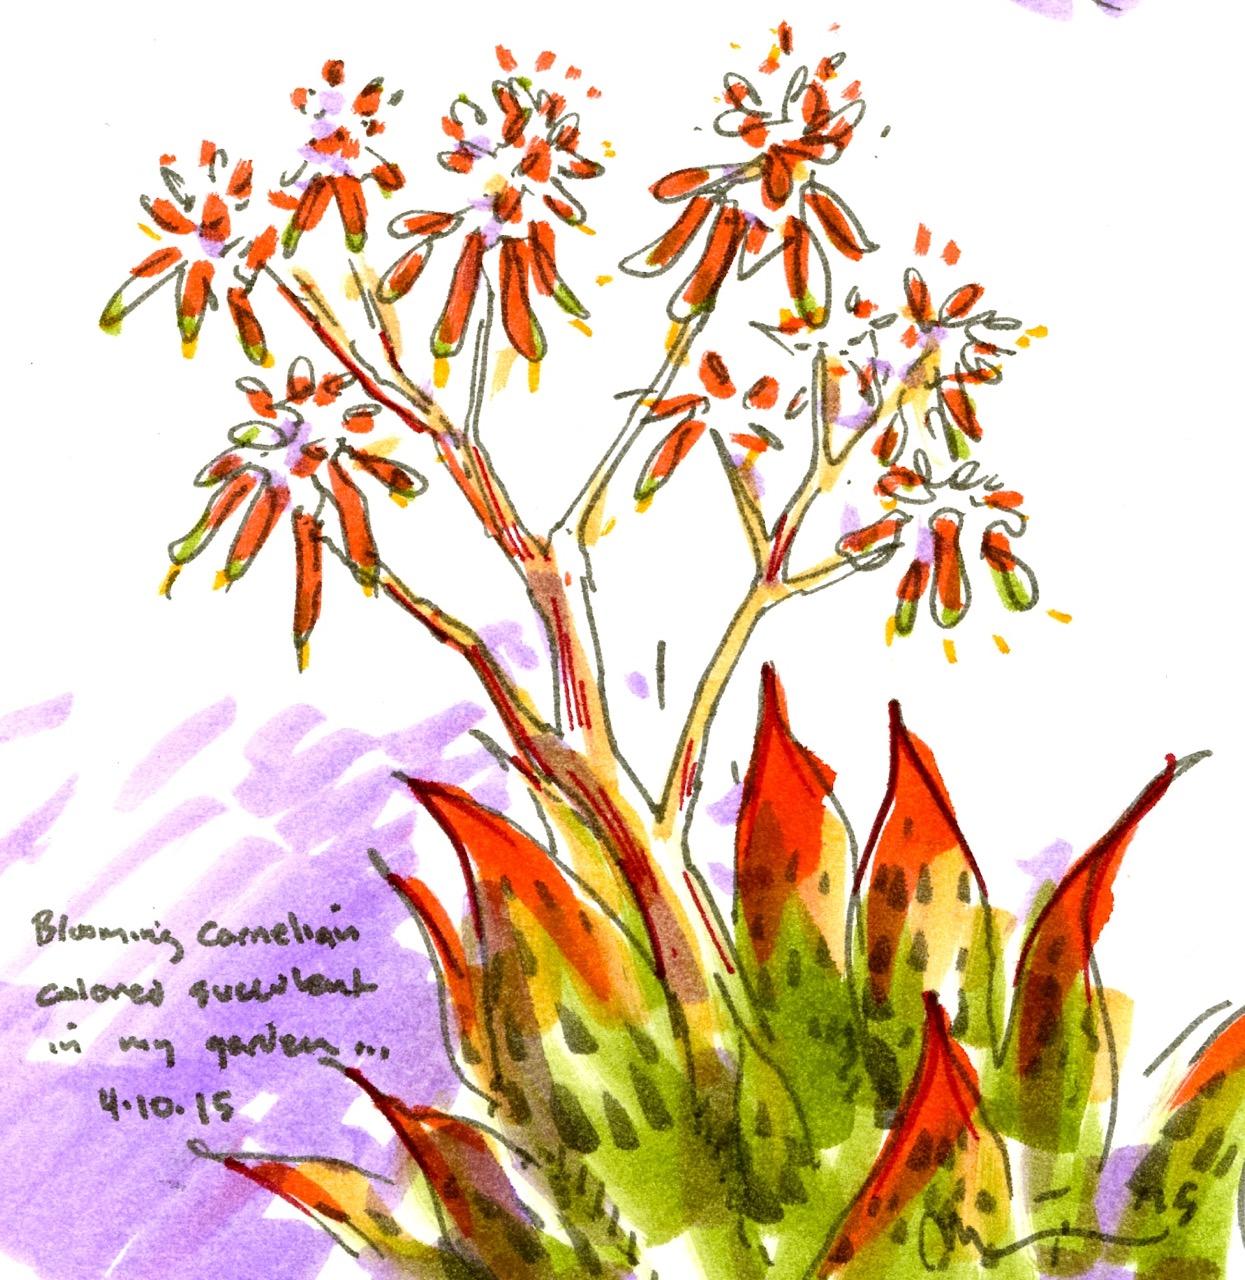 cactii n succulent 1.jpg